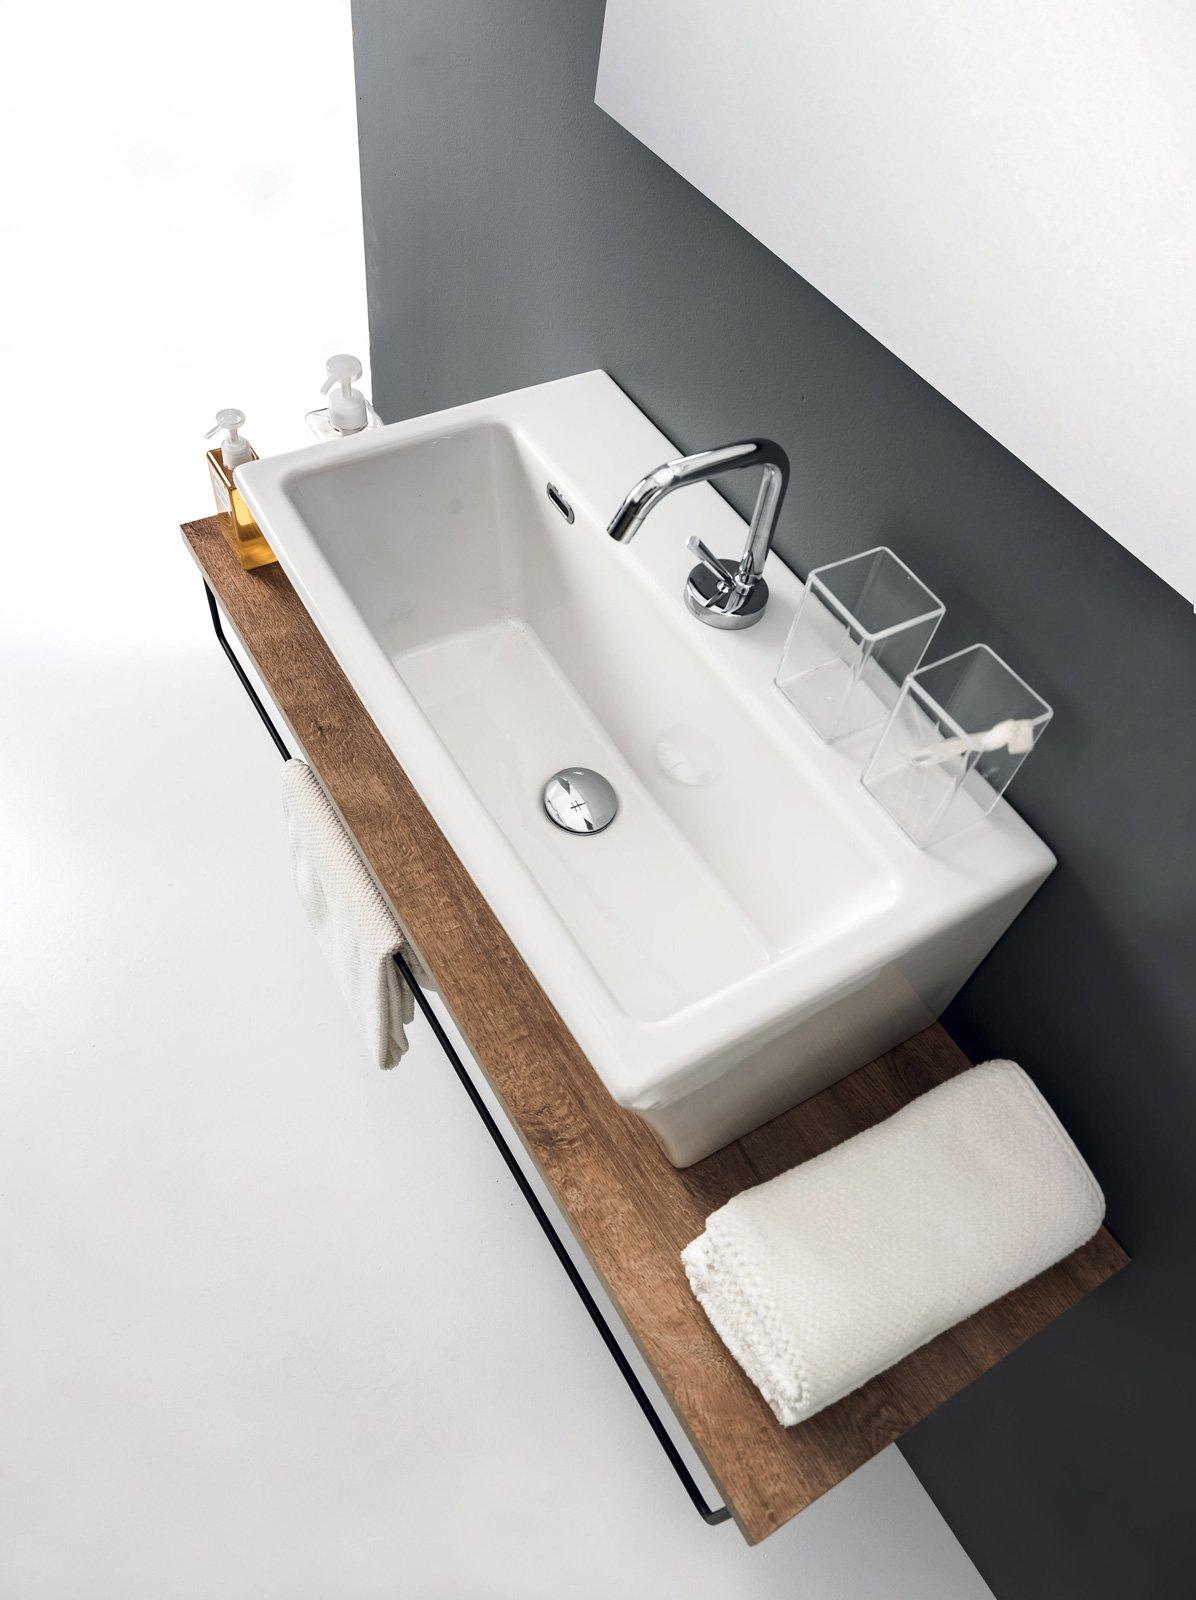 Lavabo bagno profondit 30 cm termosifoni in ghisa - Mobile profondita 30 cm ...